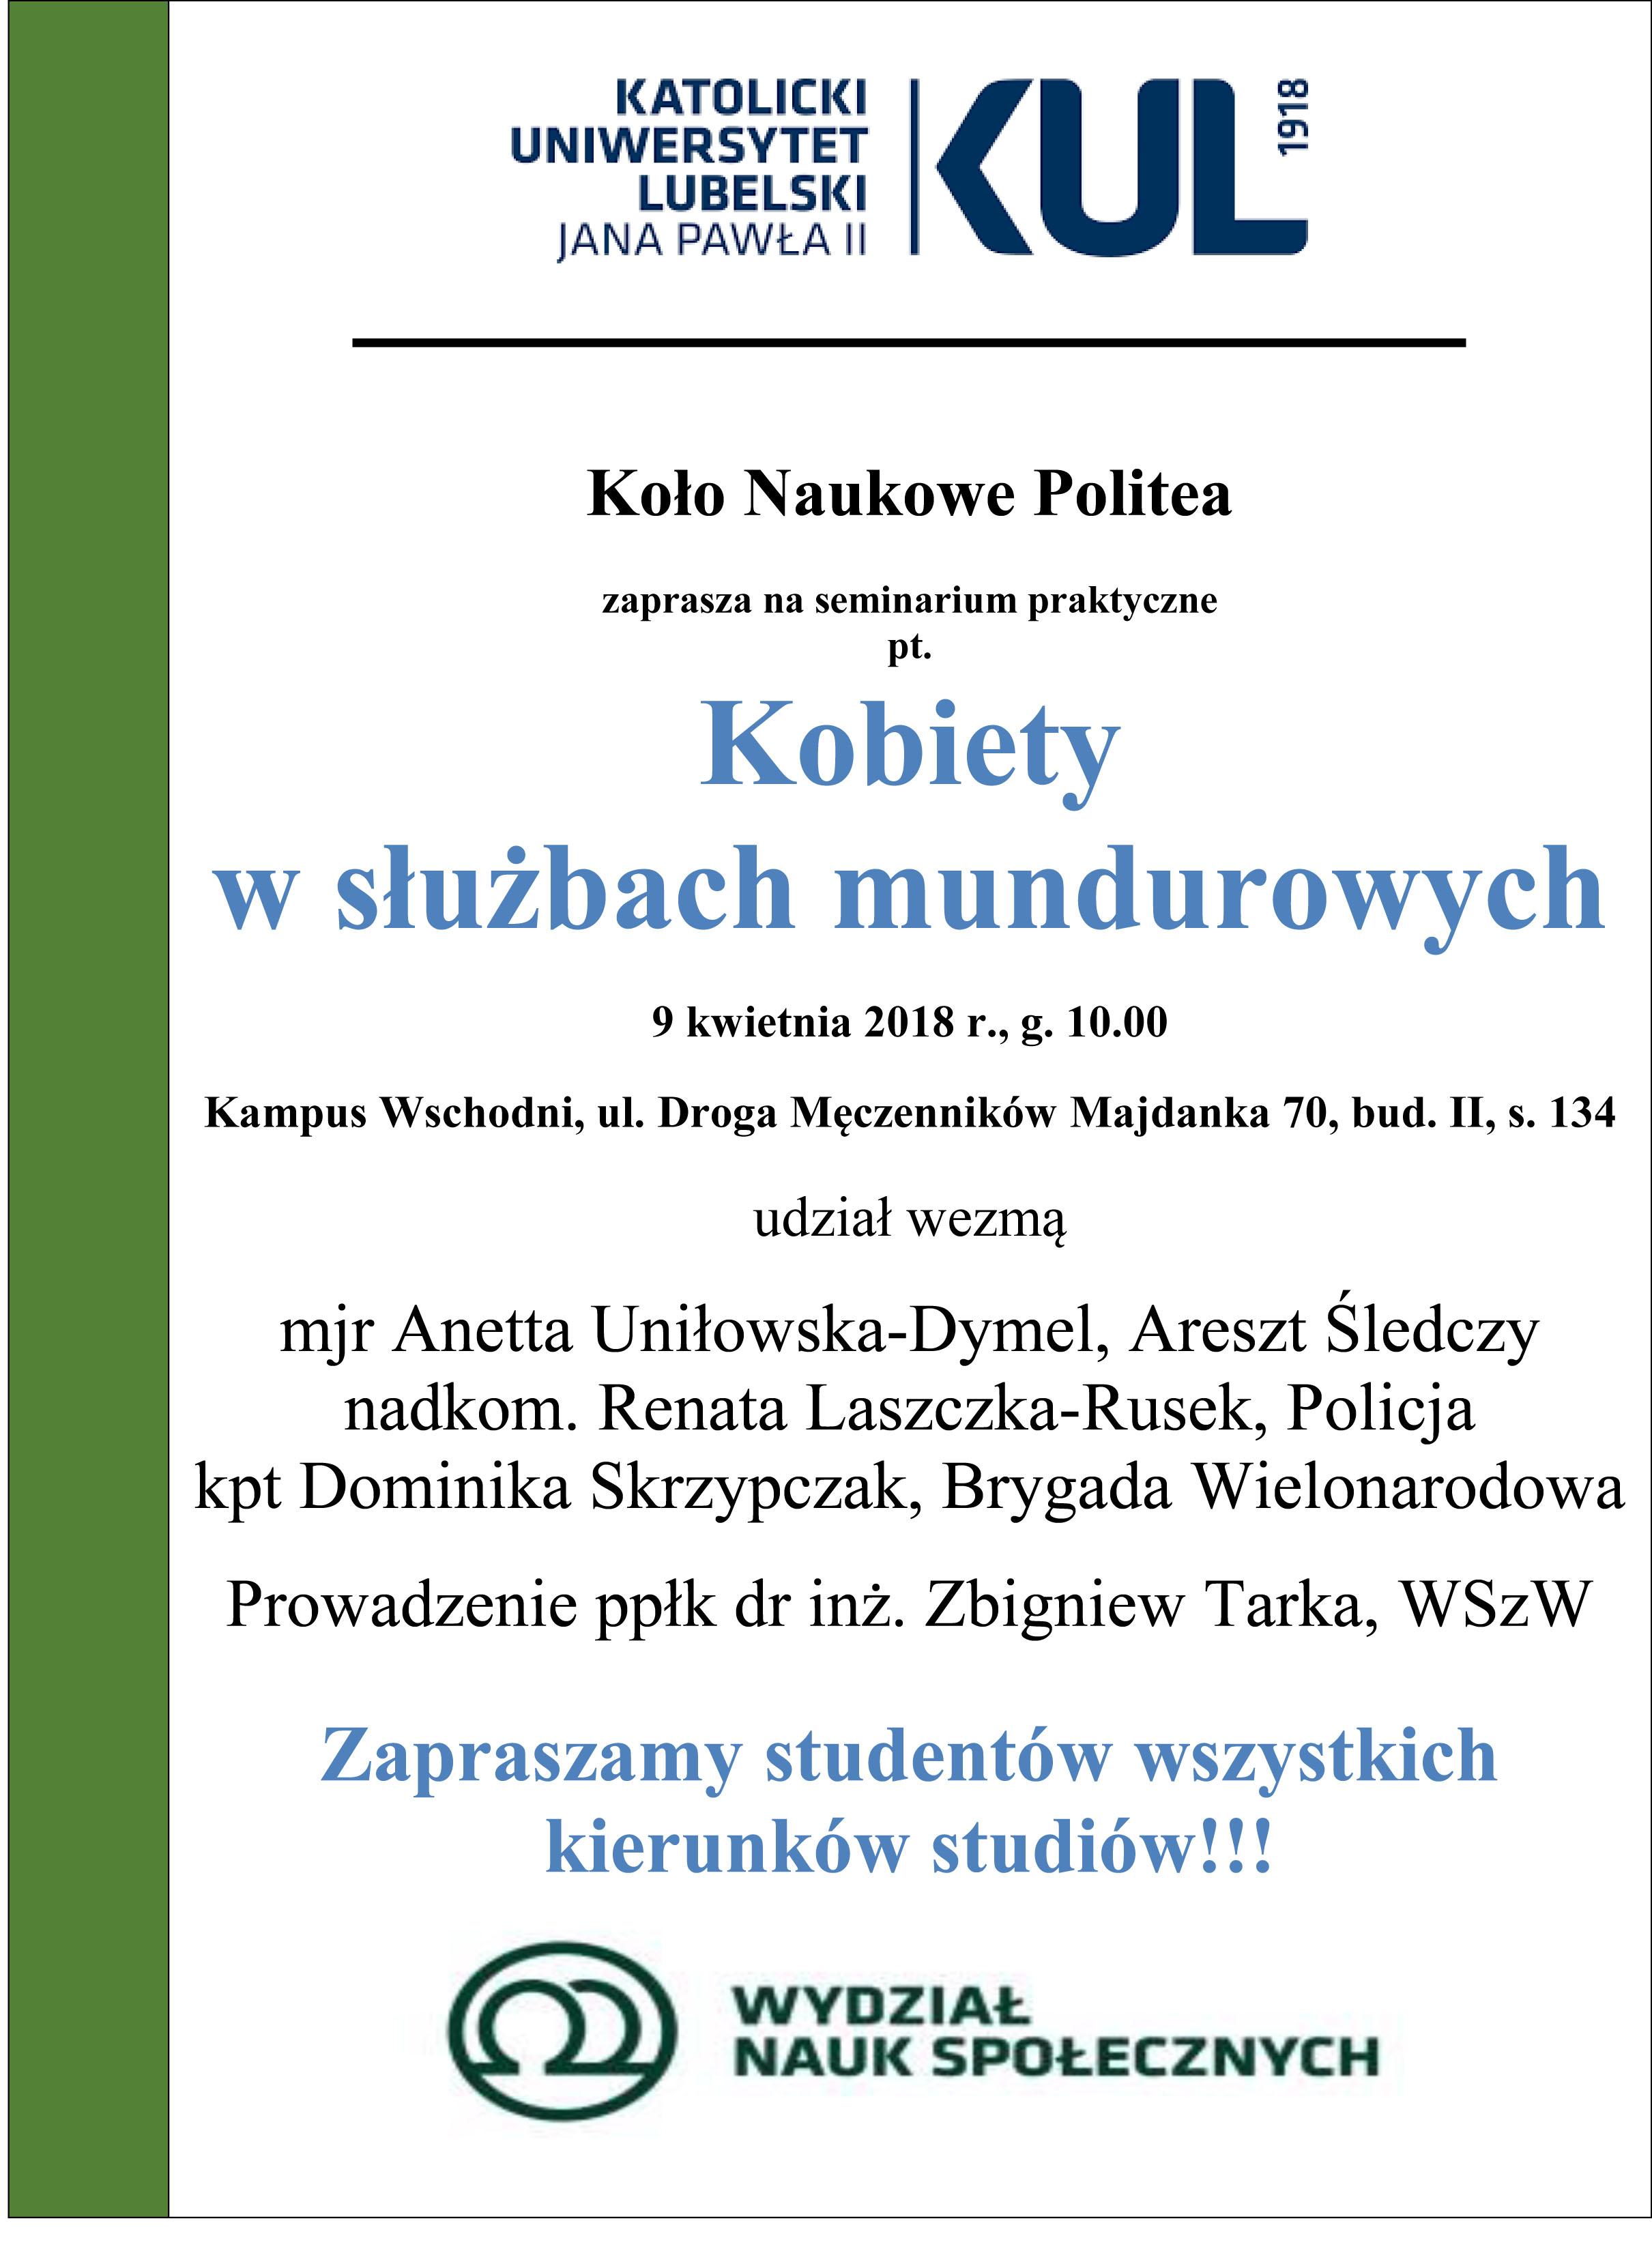 http://www.kul.pl/files/075/plakaty/2018/spotkania_wykady/plakat_kwsm_2018.jpg?1522927823302